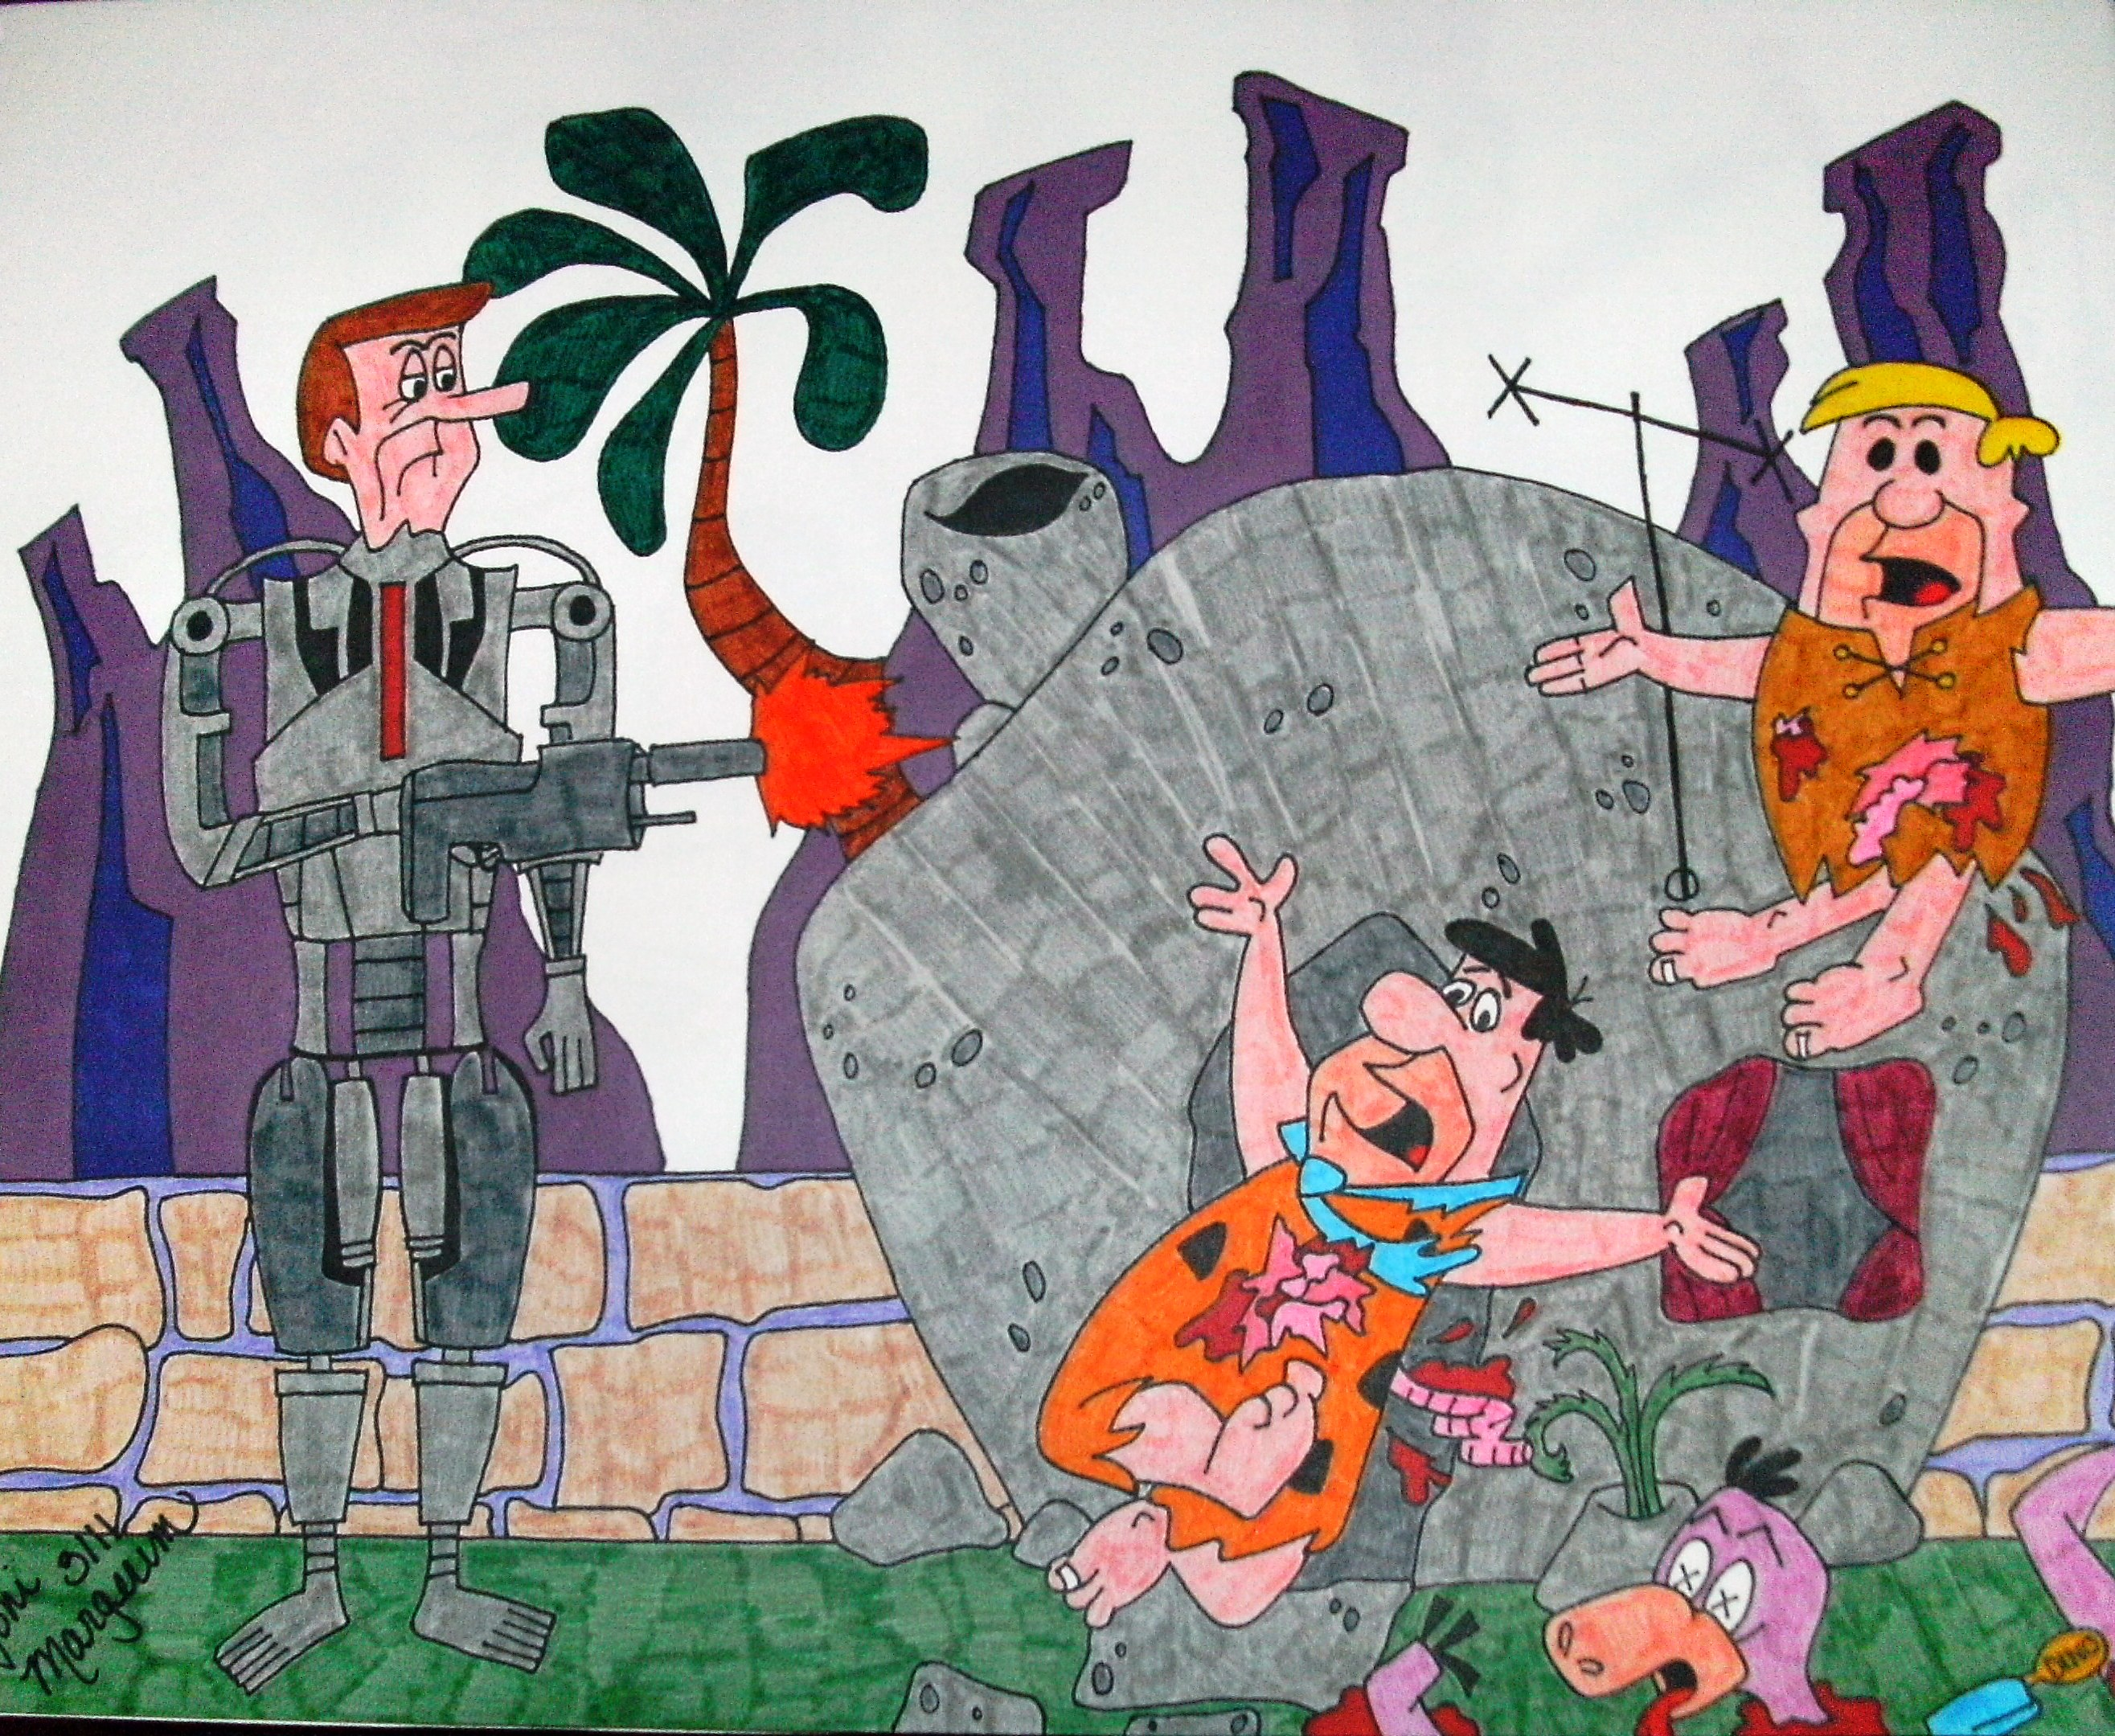 Flintstones Vs Jetsons